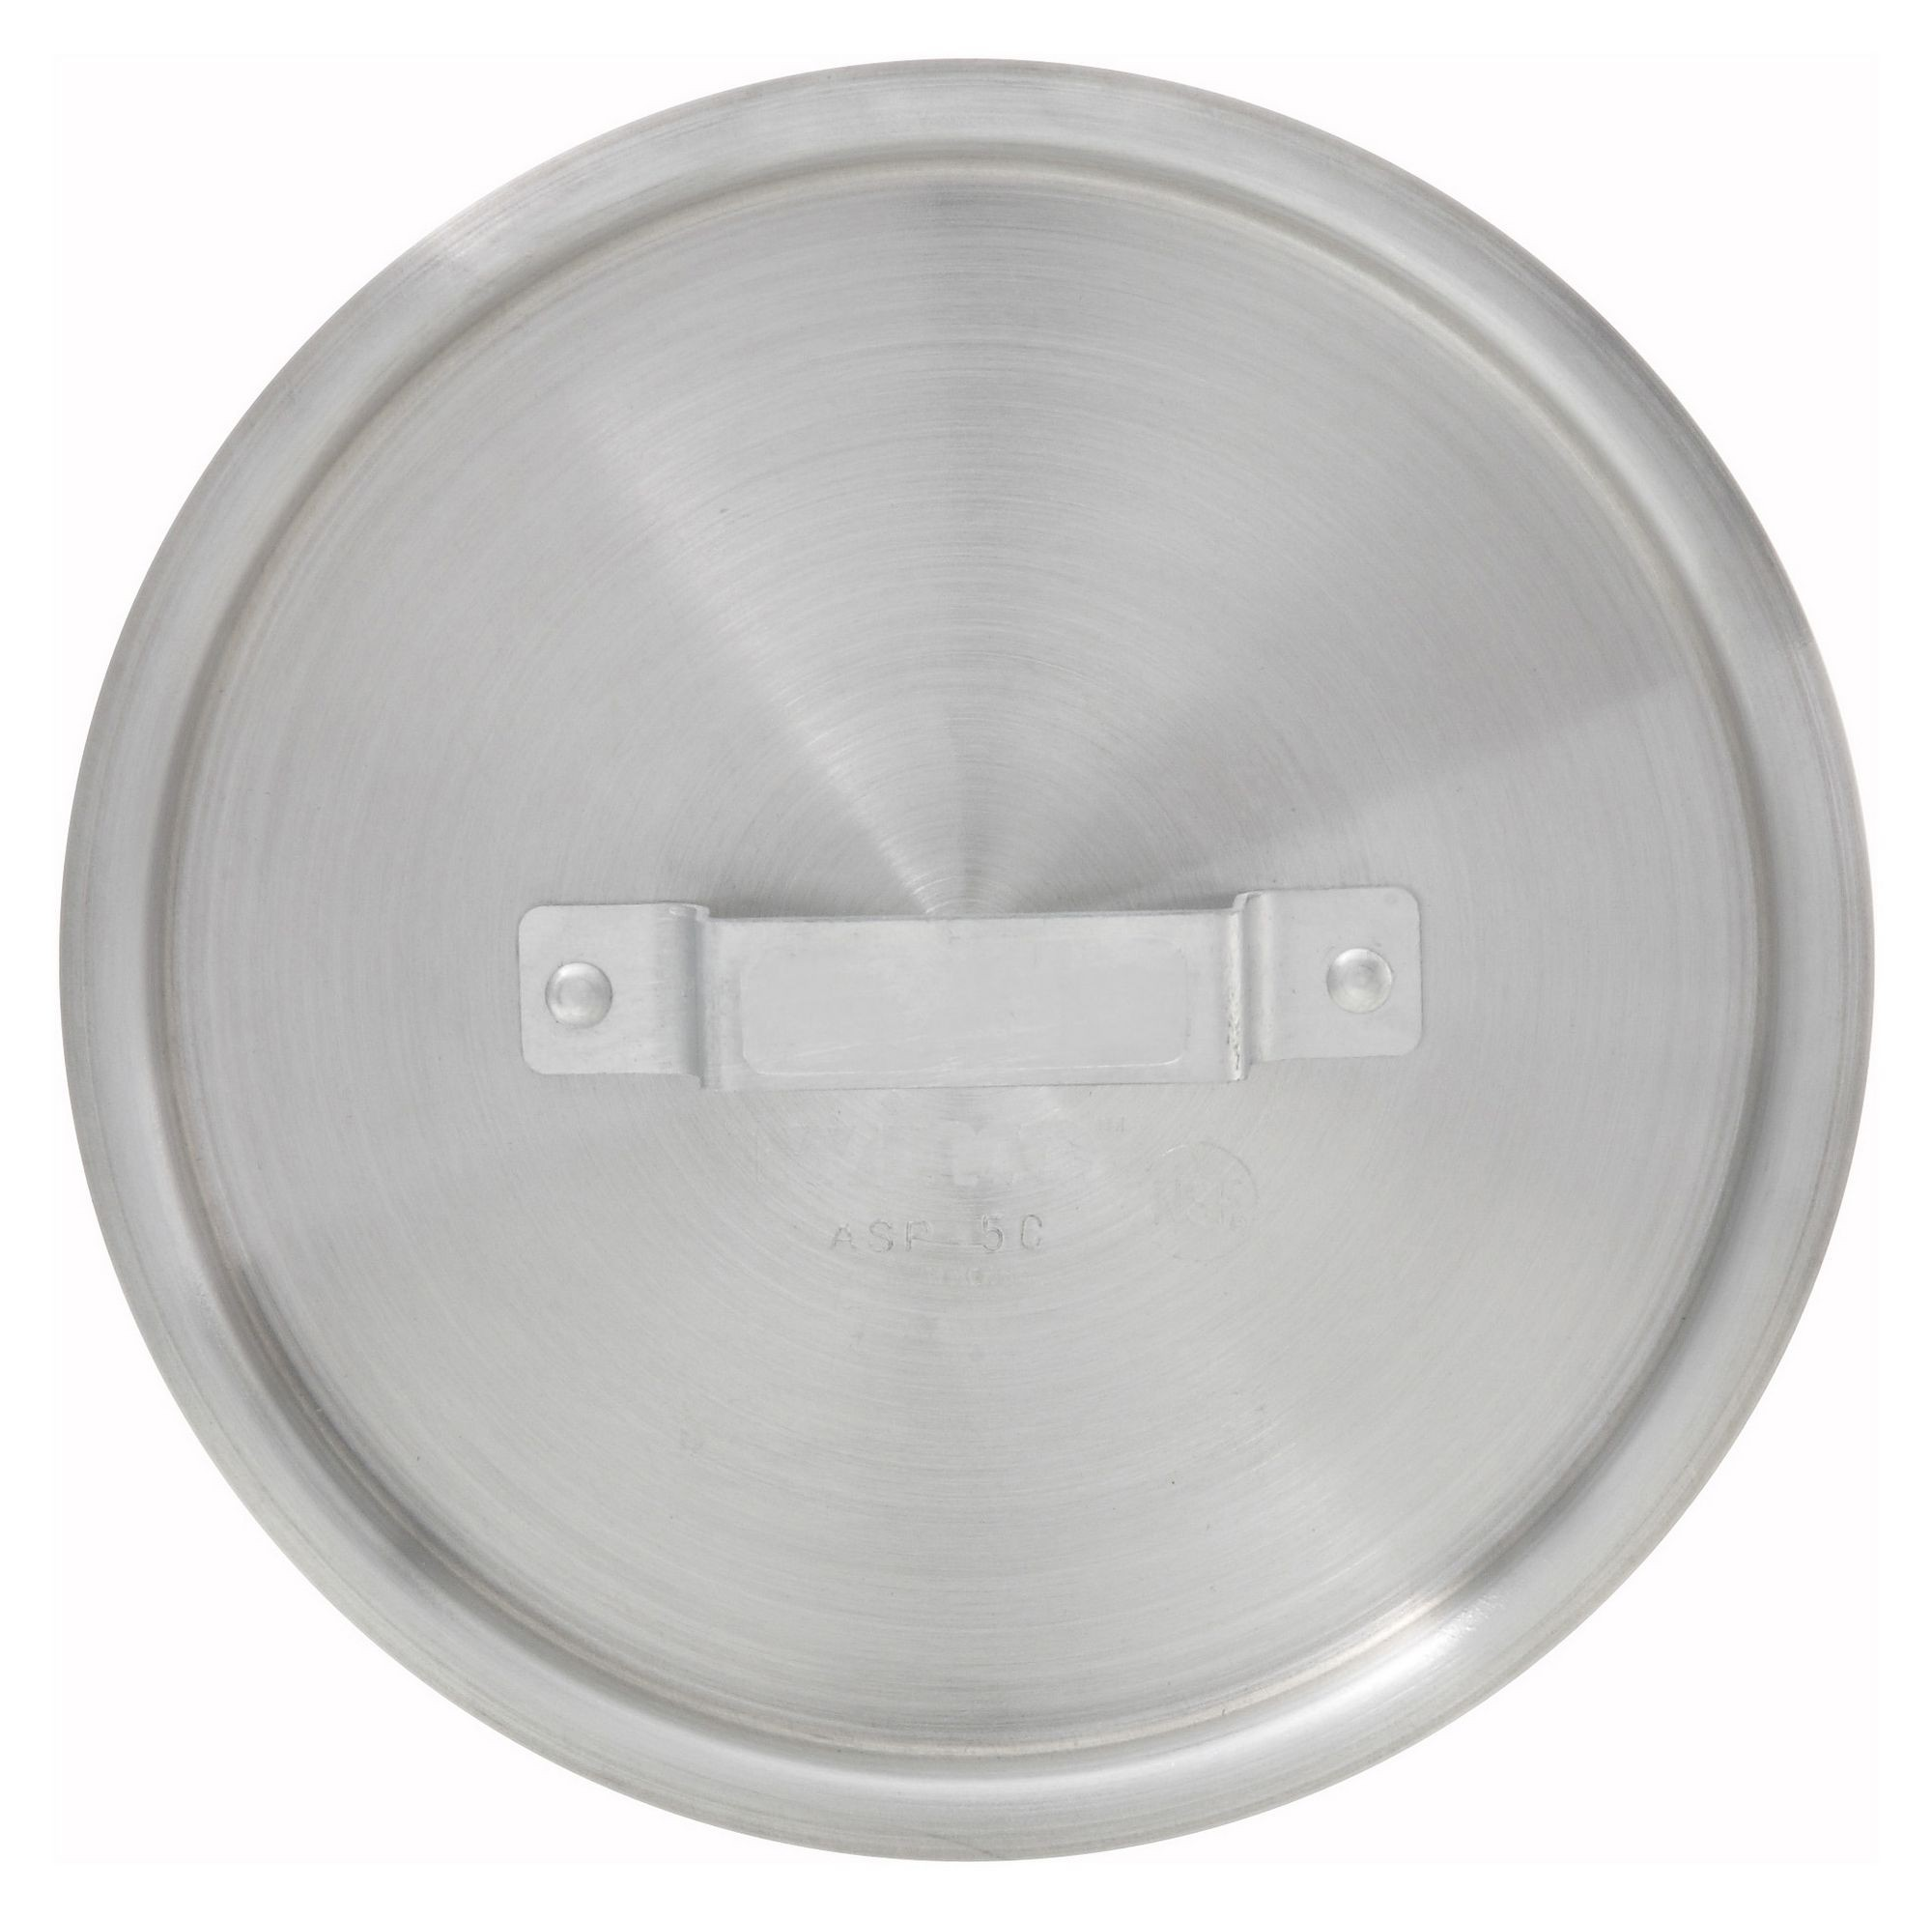 Aluminum Lid For 4.25-Qt Sauce Pan (ASP-4)